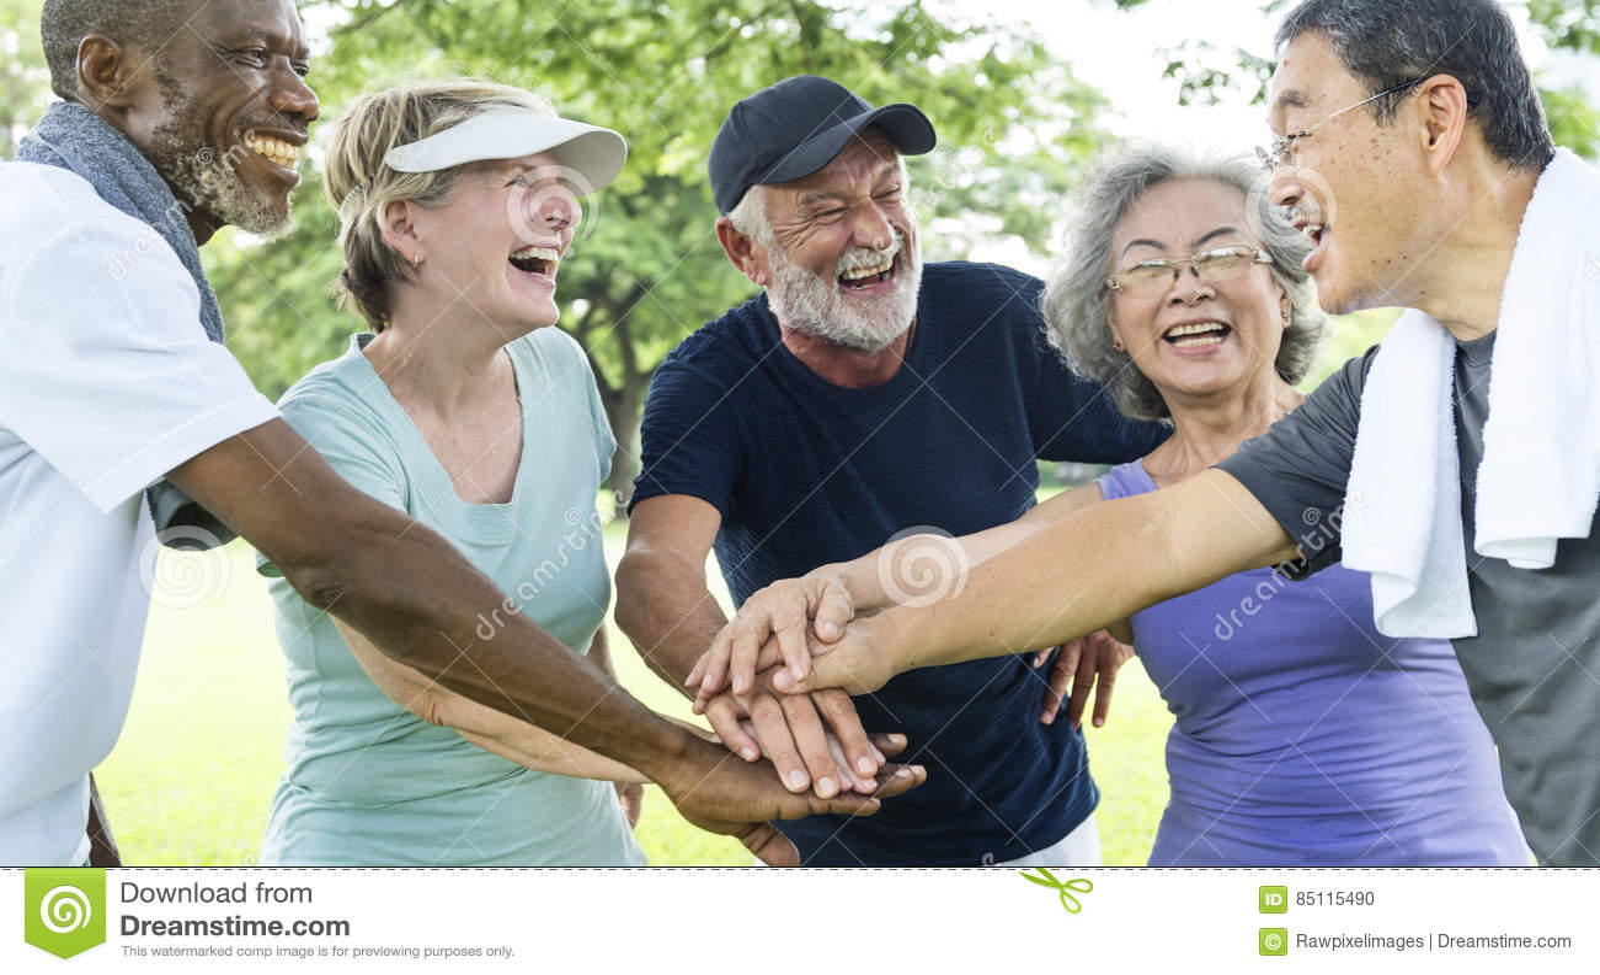 Groep die Hogere Pensionering Samenhorigheidsconcept uitoefenen